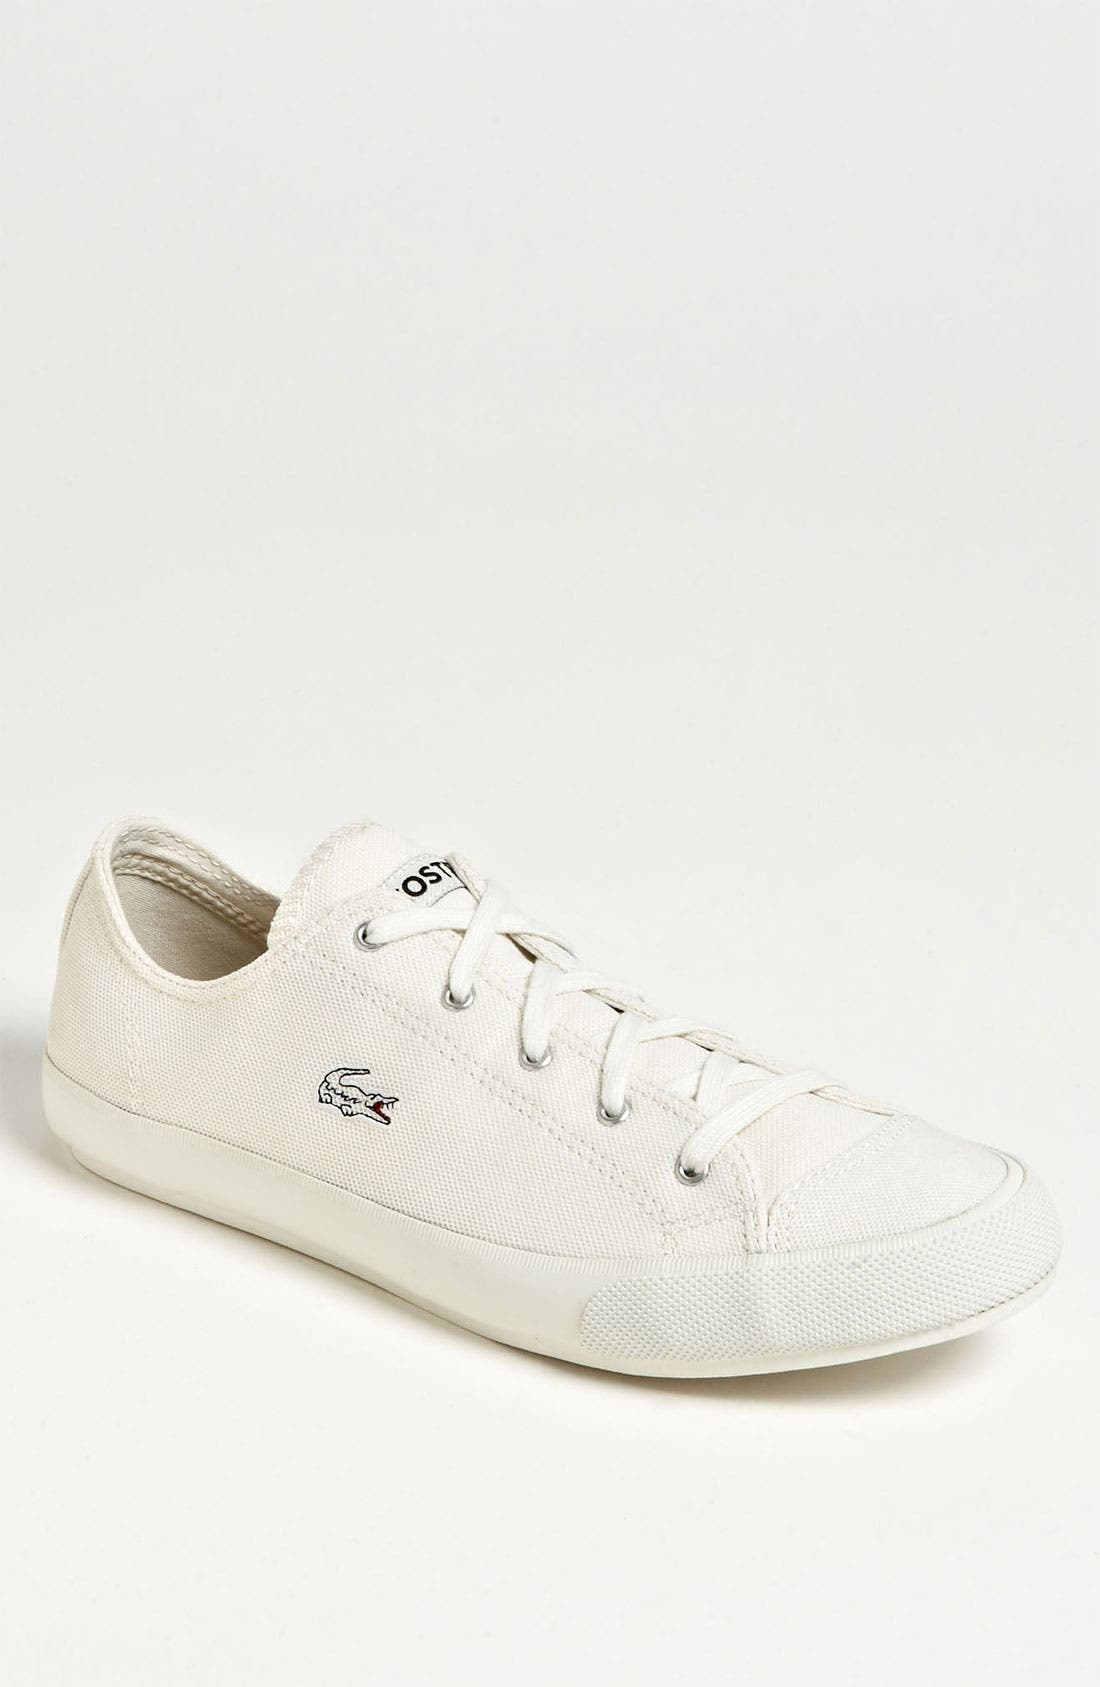 Main Image - Lacoste 'Fairburn' Sneaker